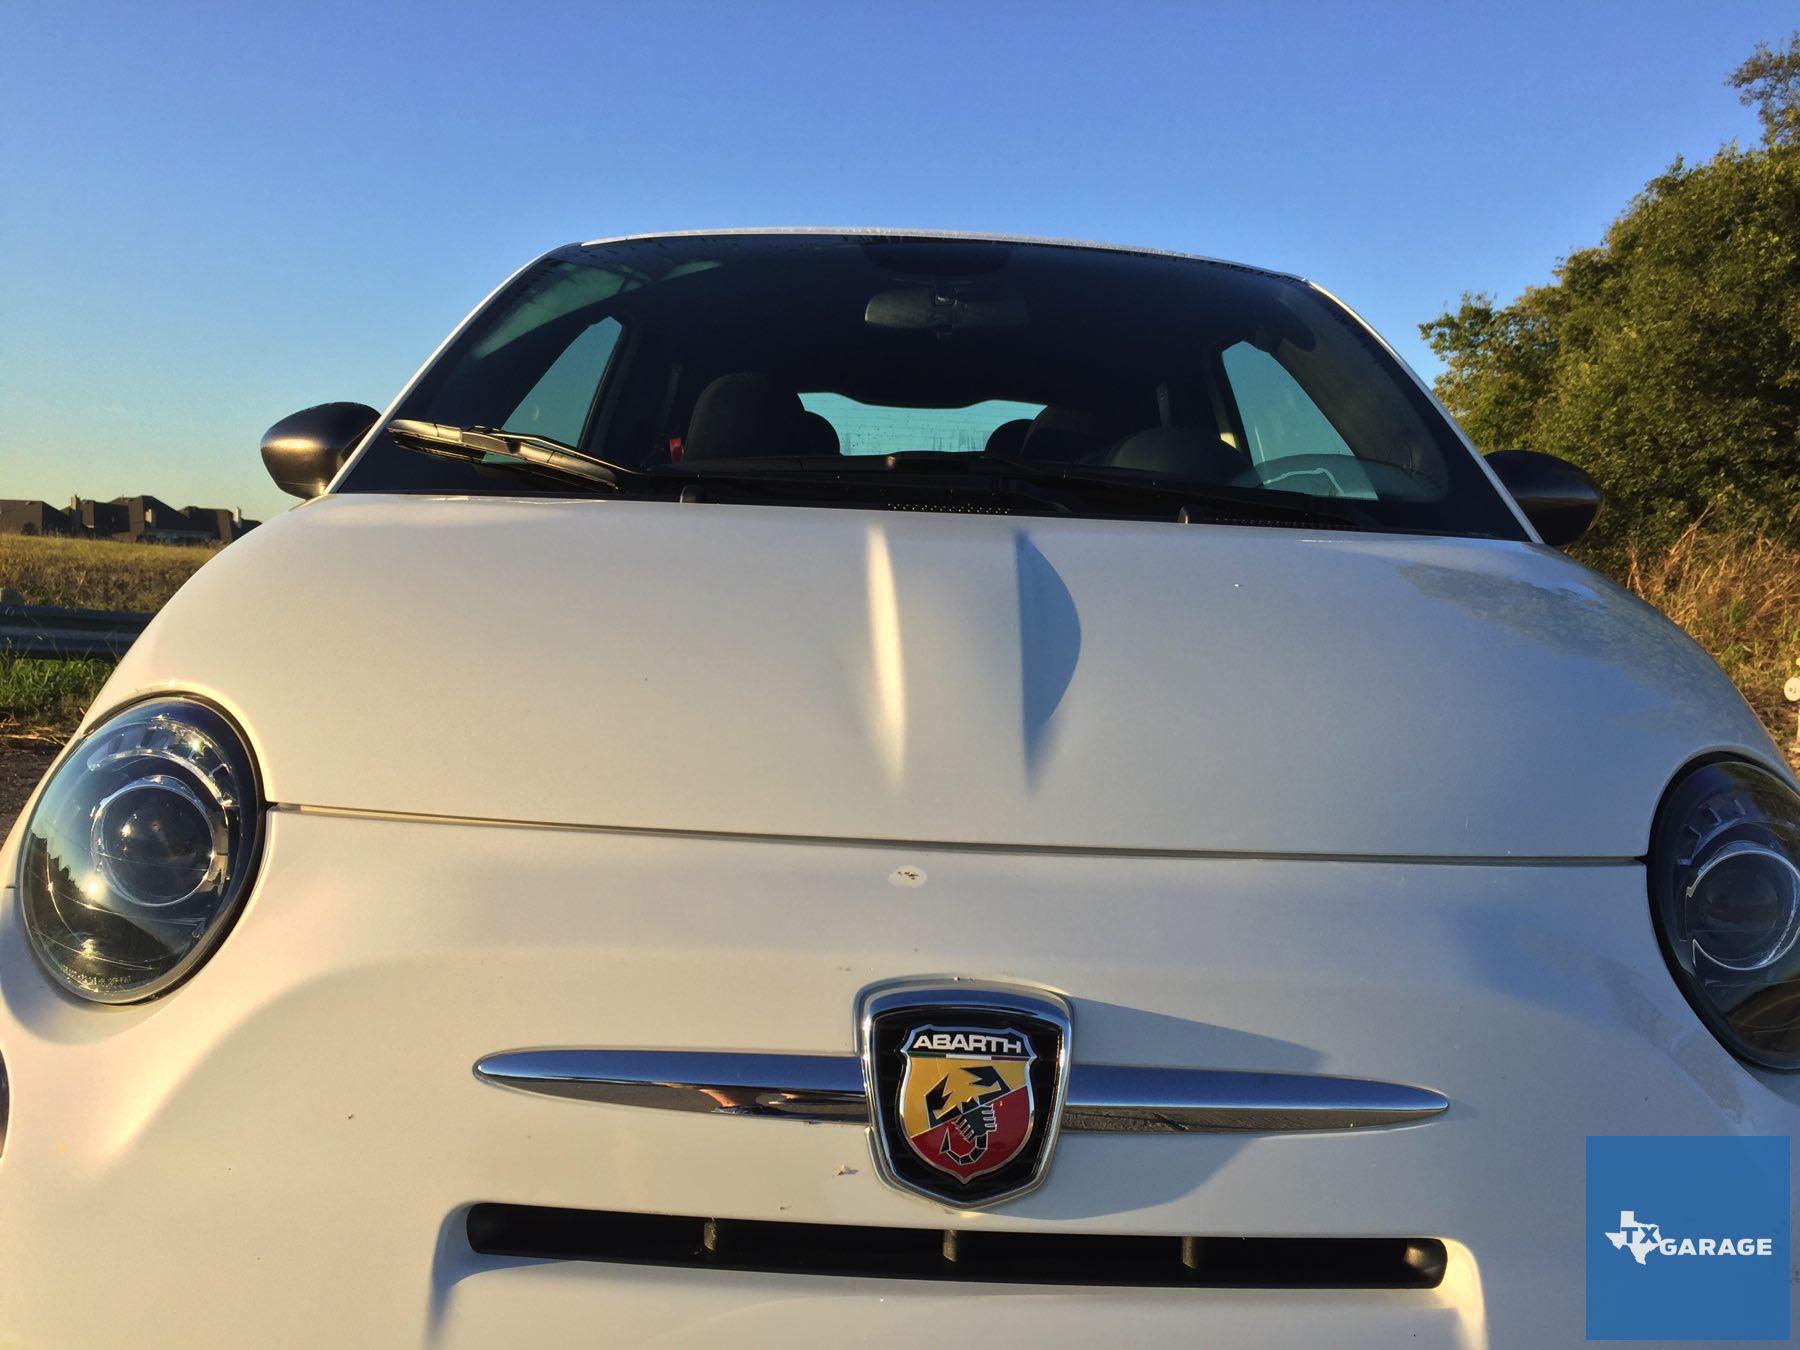 2015-Fiat-500-Abarth-txGarage-036